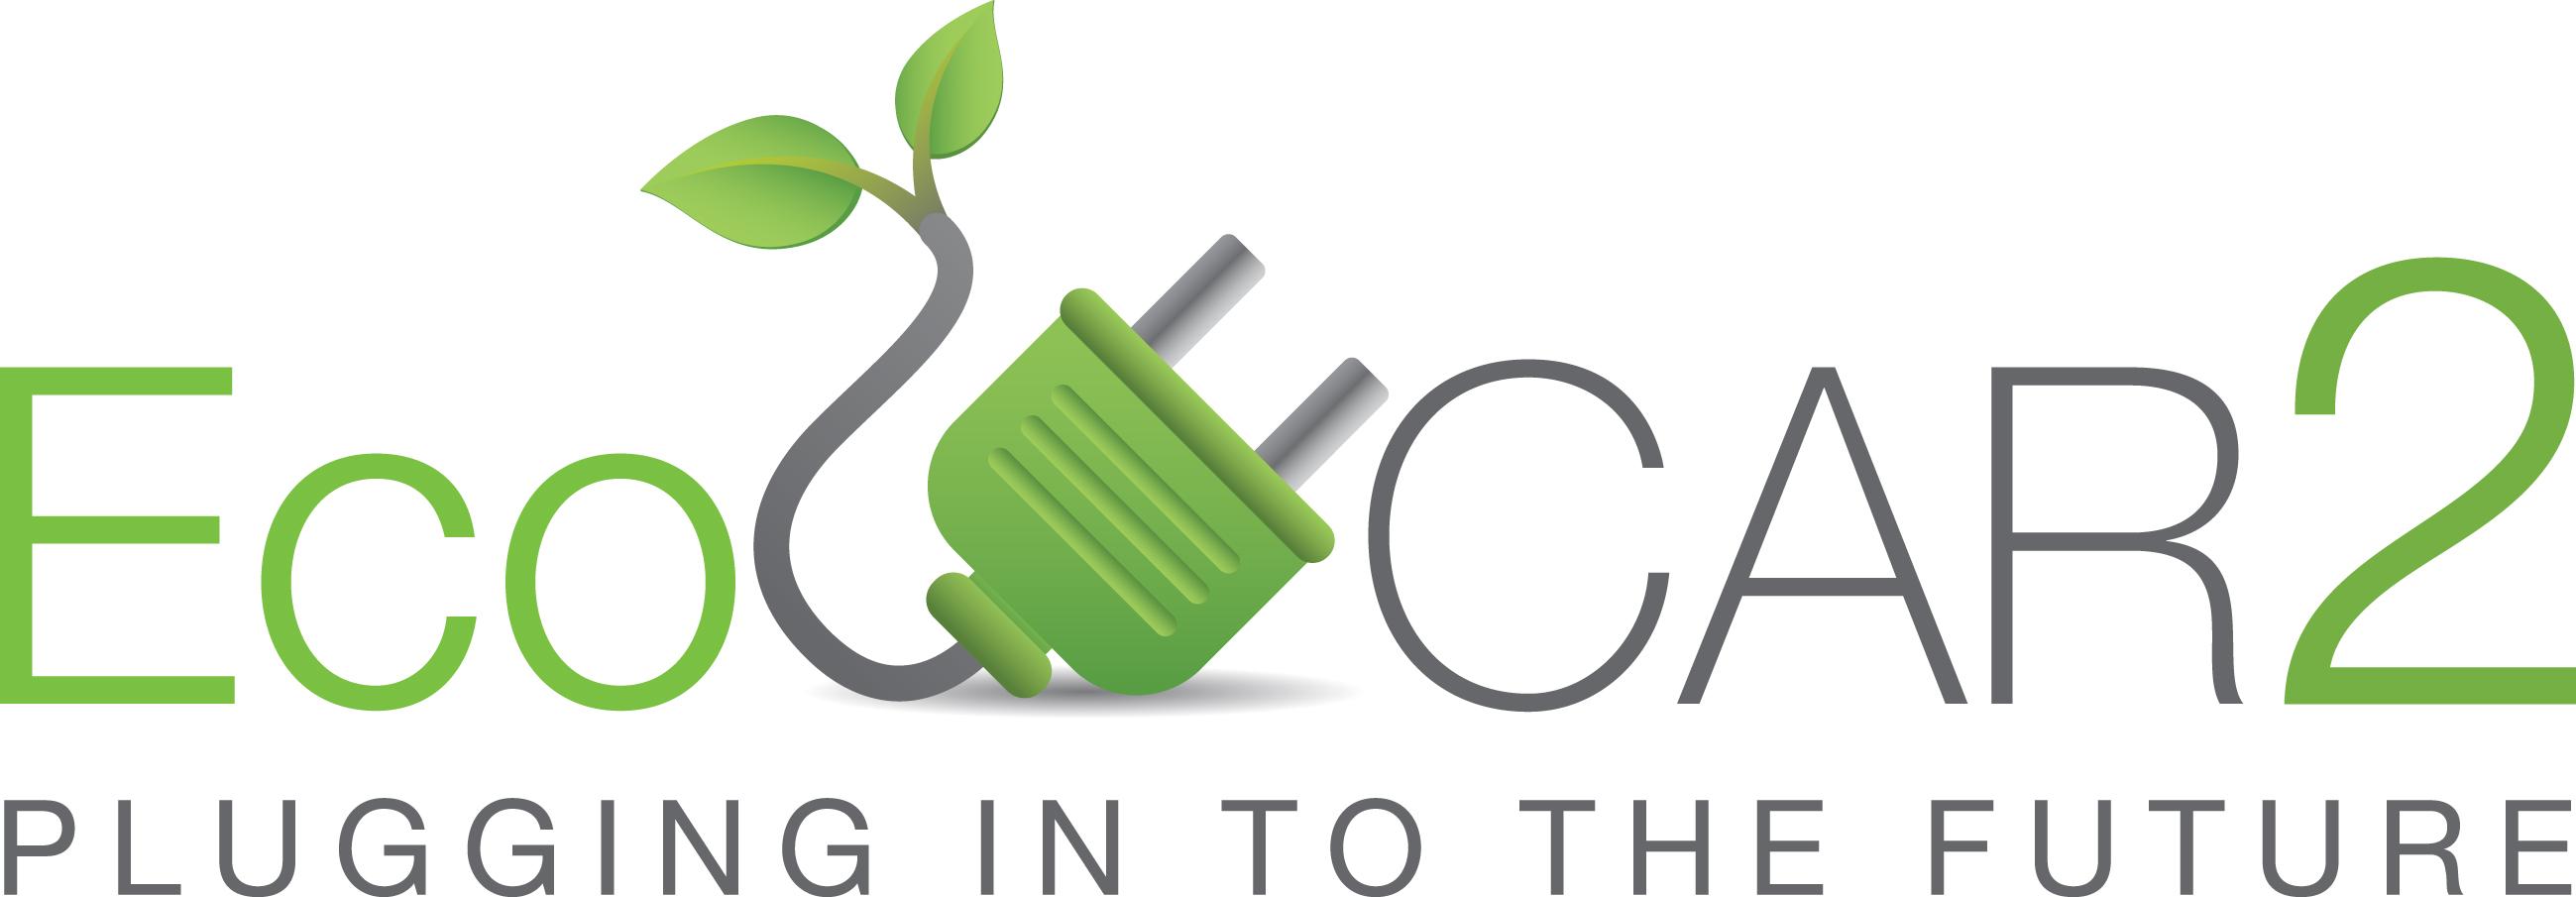 EcoCAR2_Logo_FinalOutlined